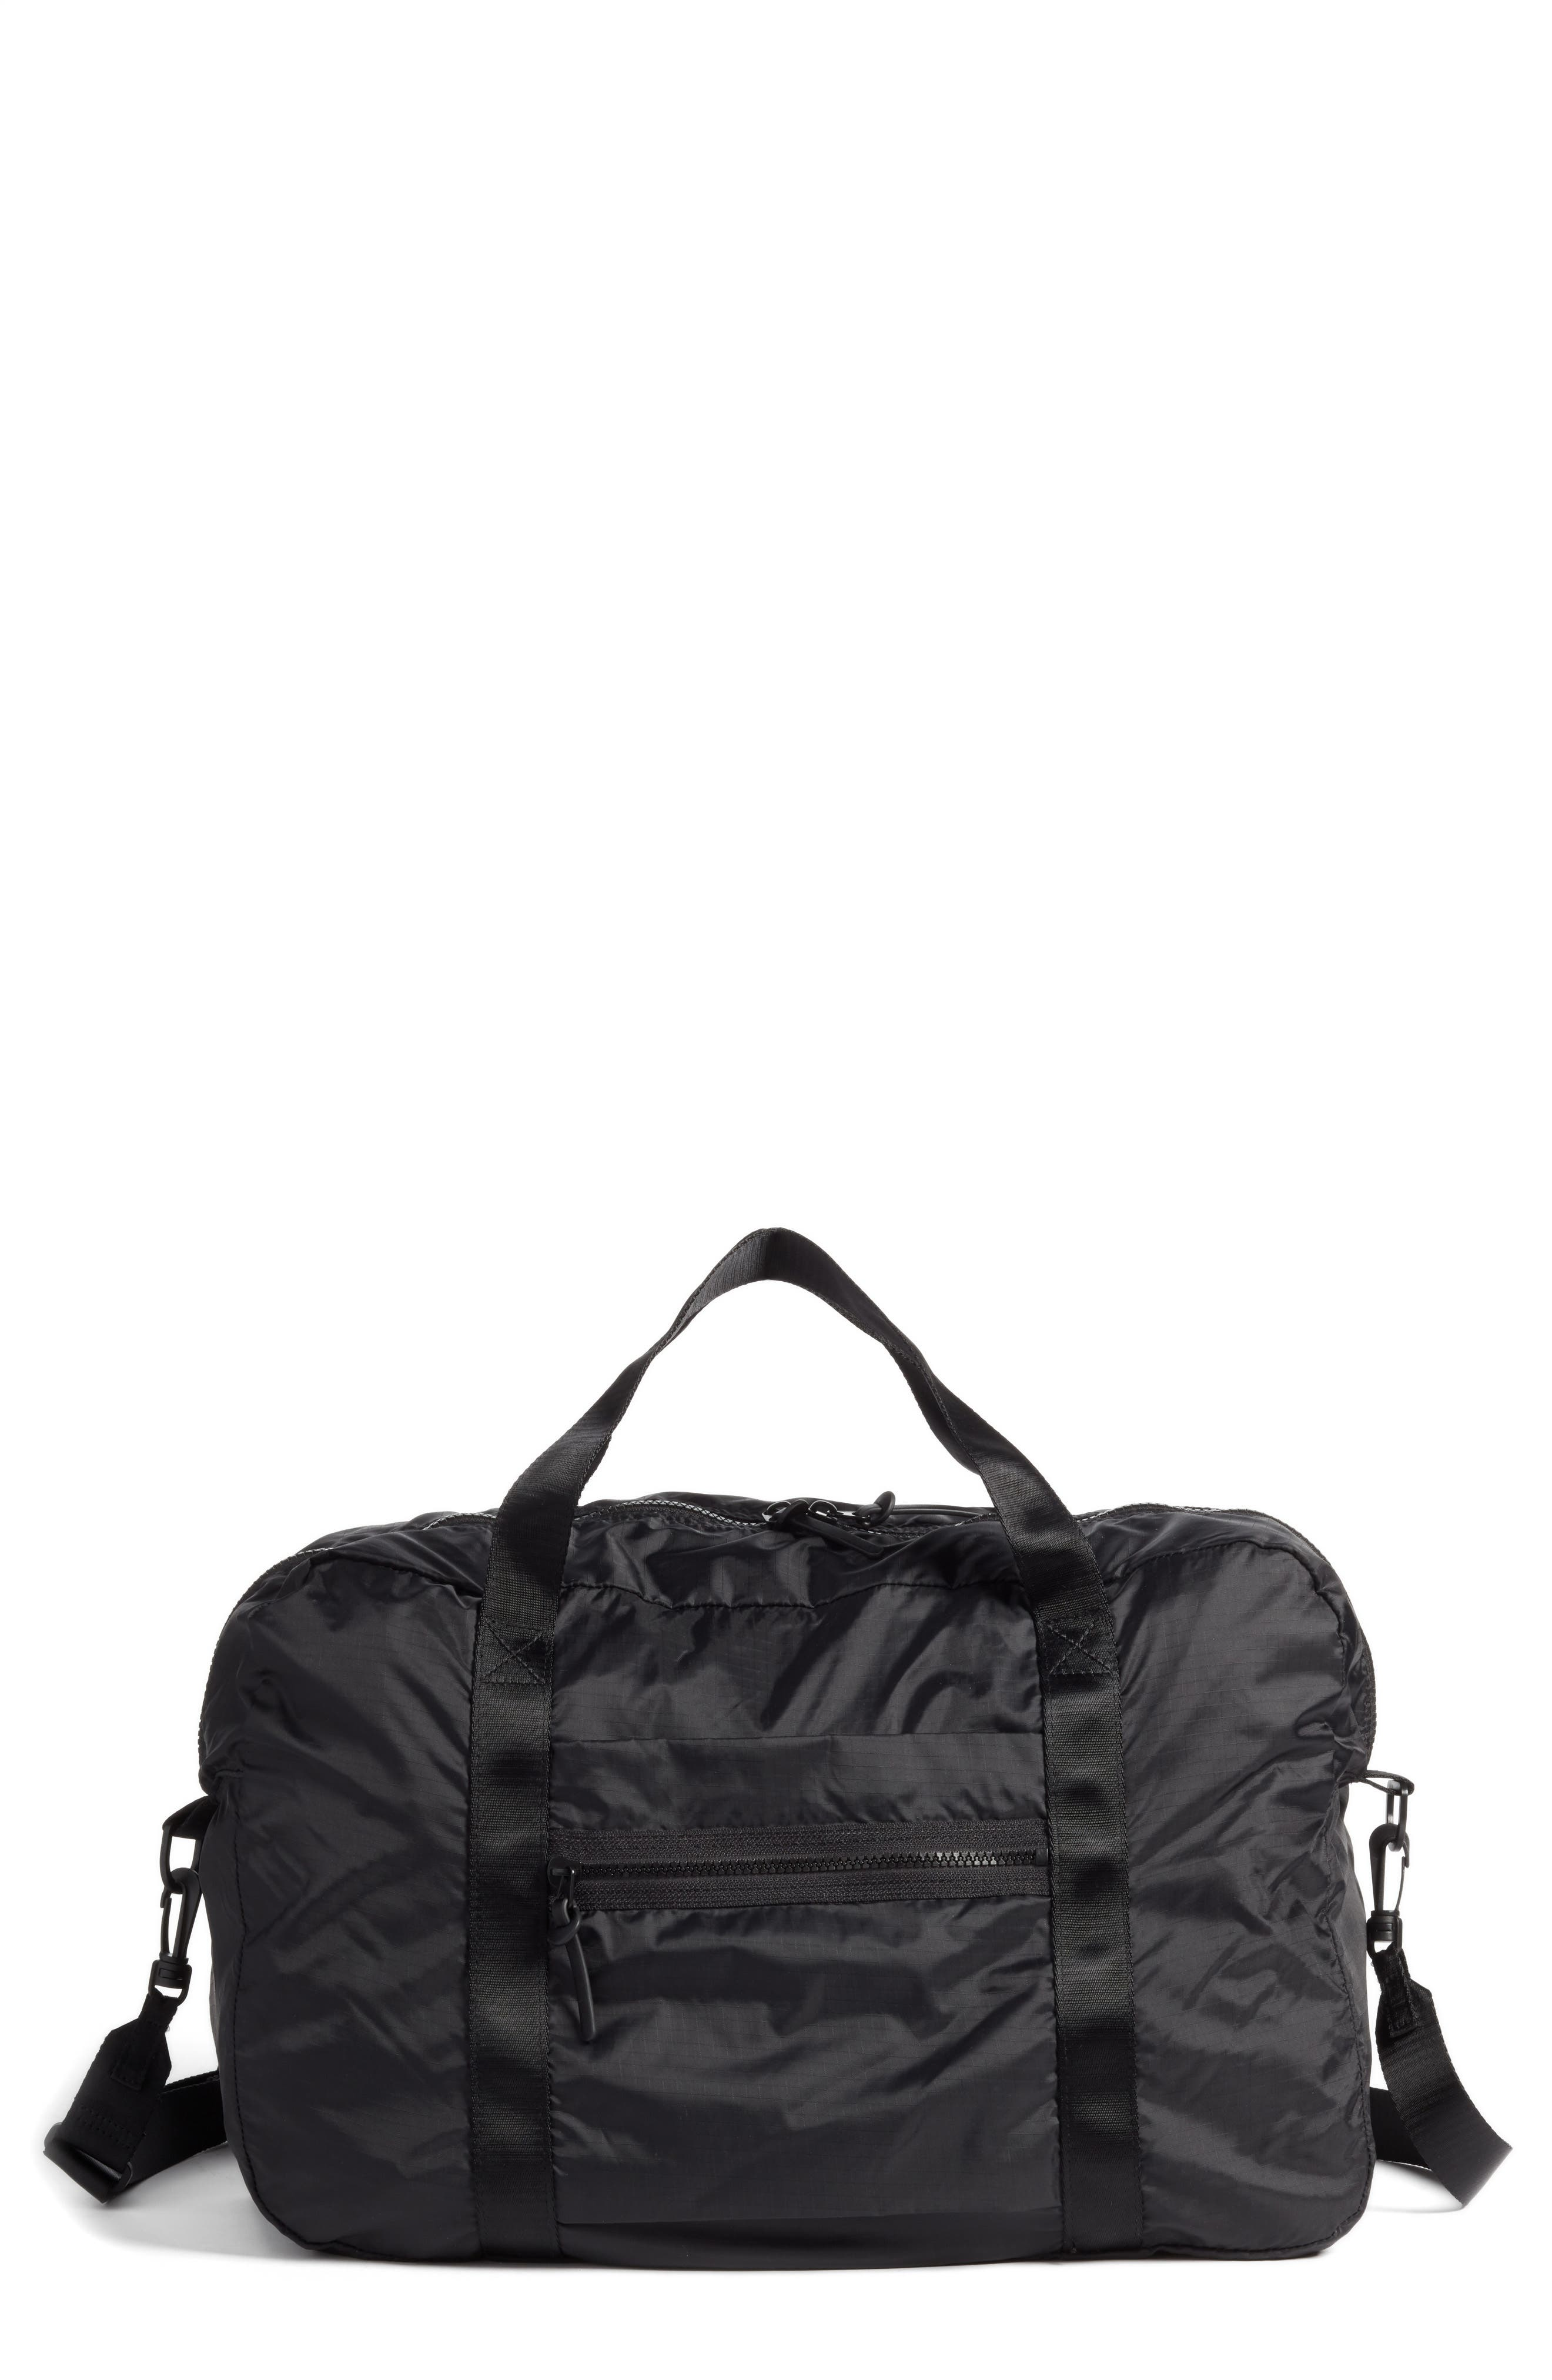 NORDSTROM, Packable Nylon Duffel Bag, Main thumbnail 1, color, BLACK